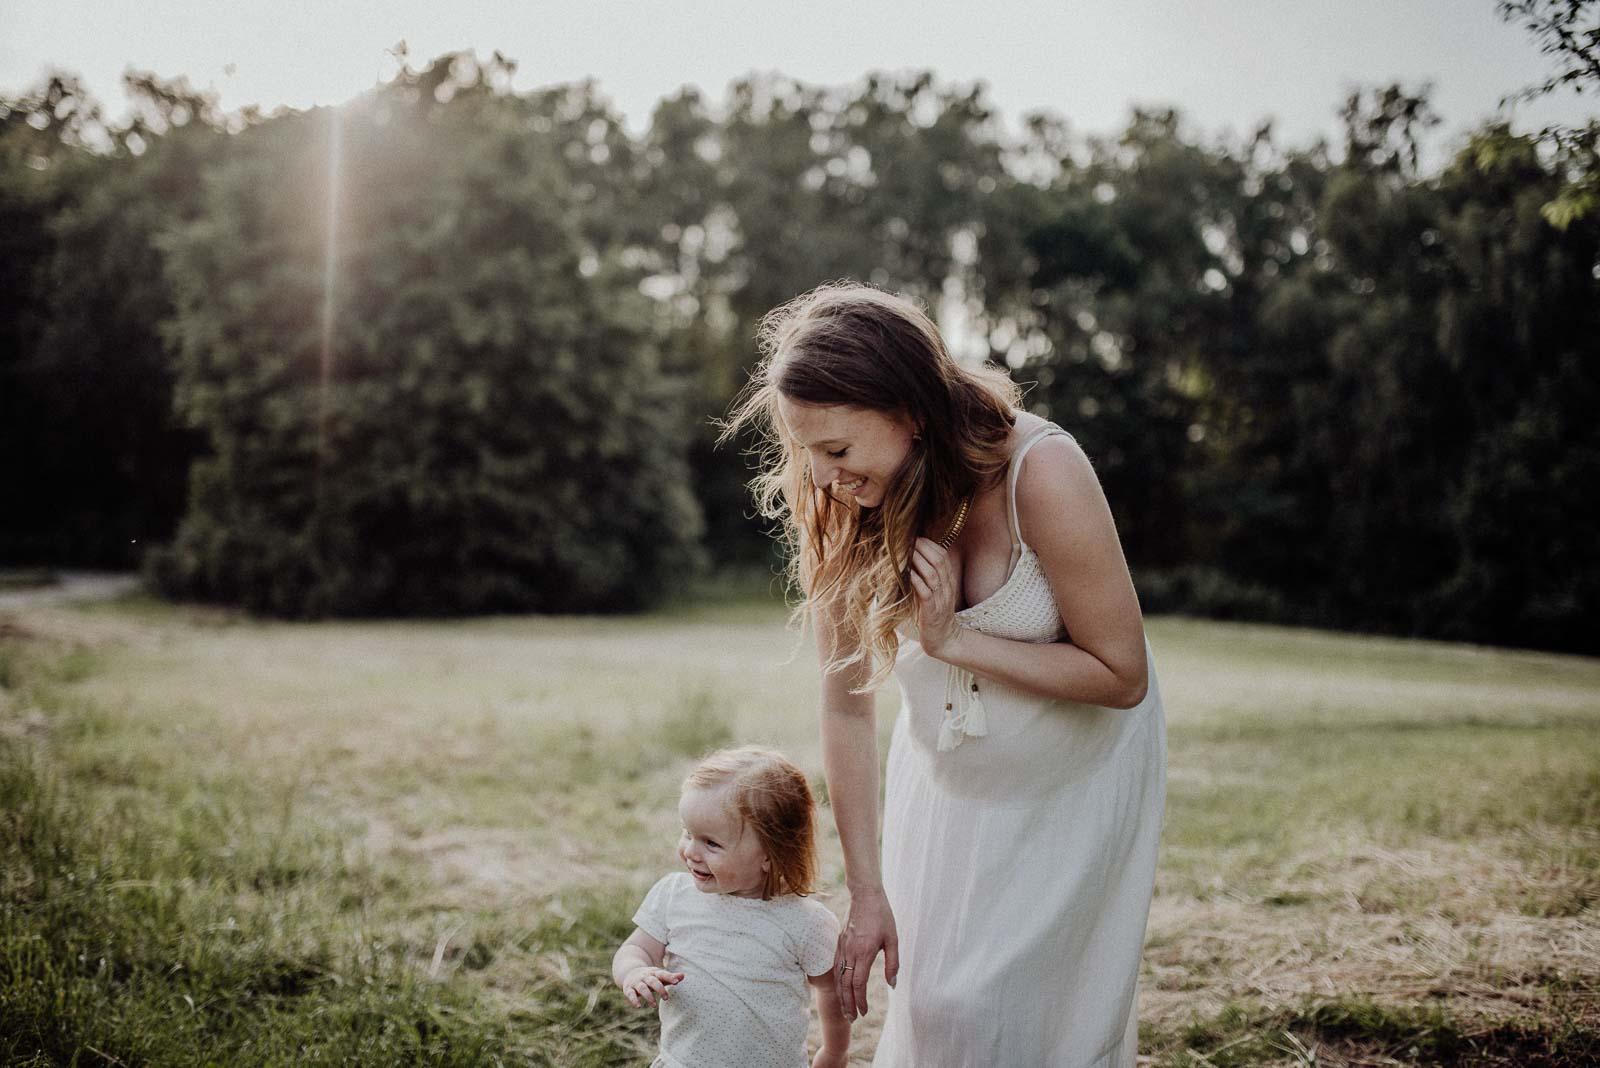 047-familien-fotoshooting-herne-heide